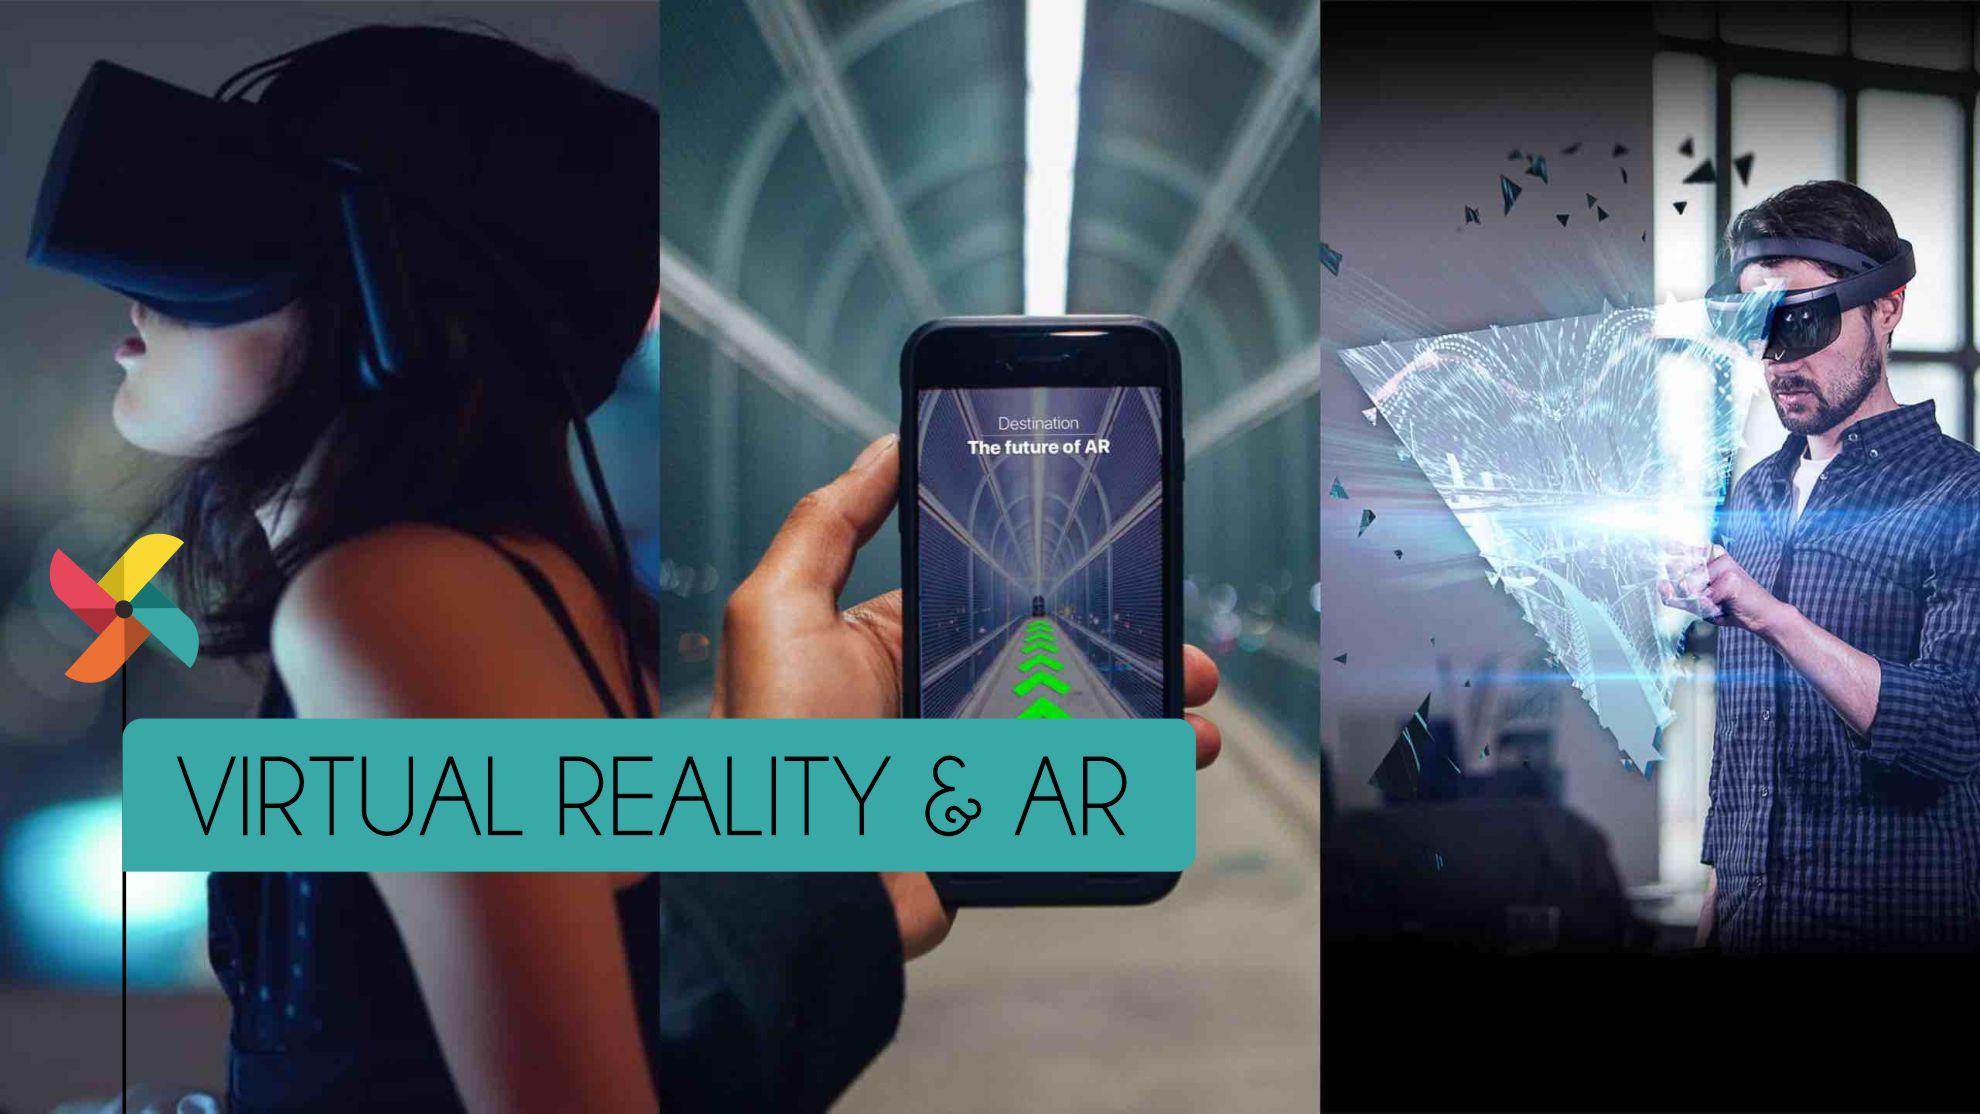 Virtual Reality & AR